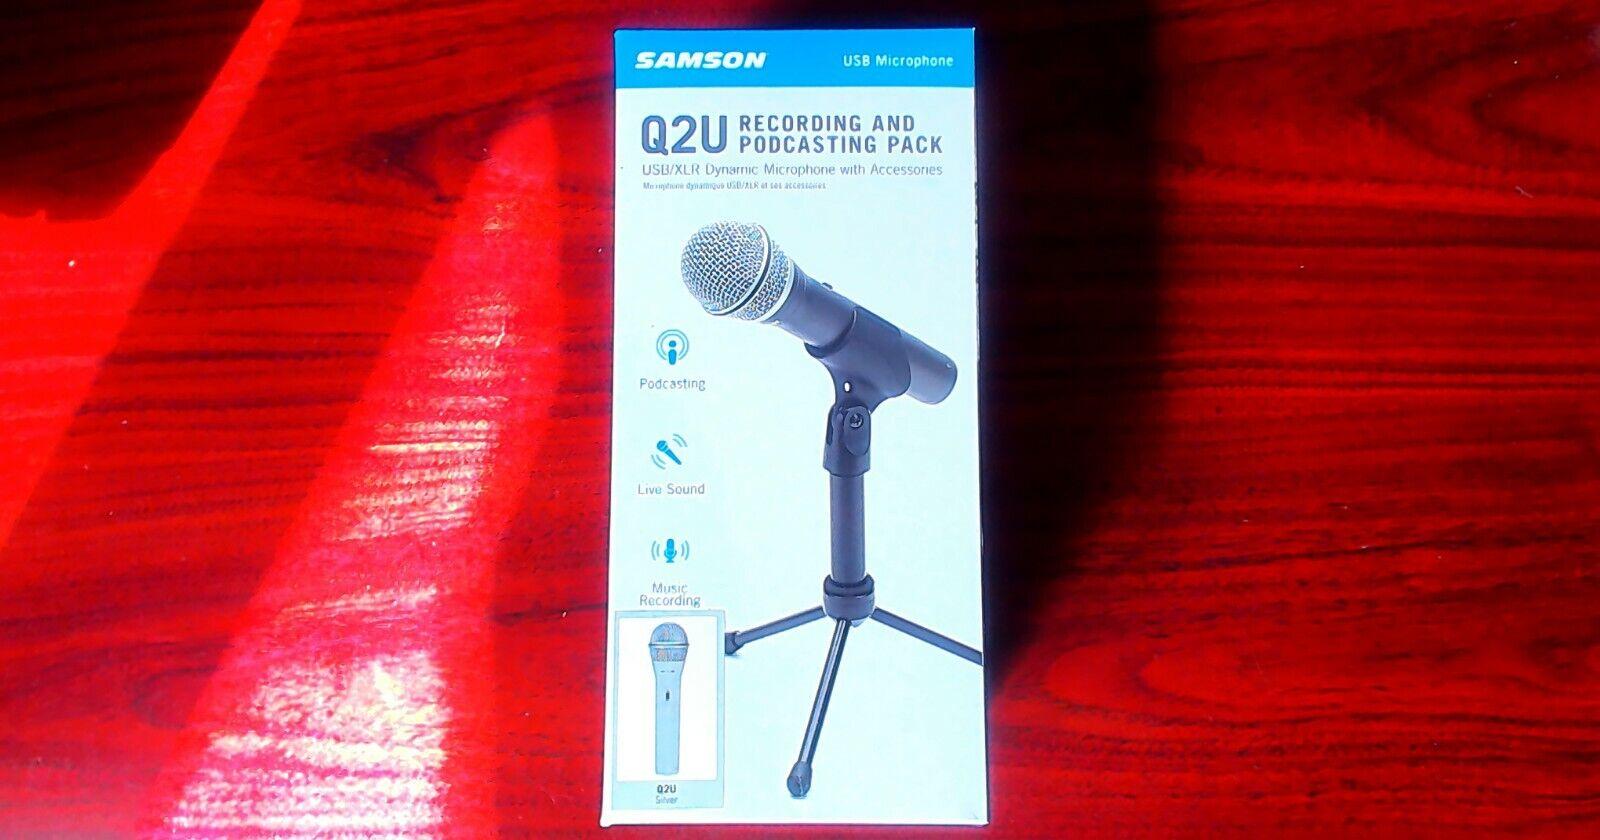 New PODCAST Recording Pack - Samson Q2U Handheld Dynamic USB